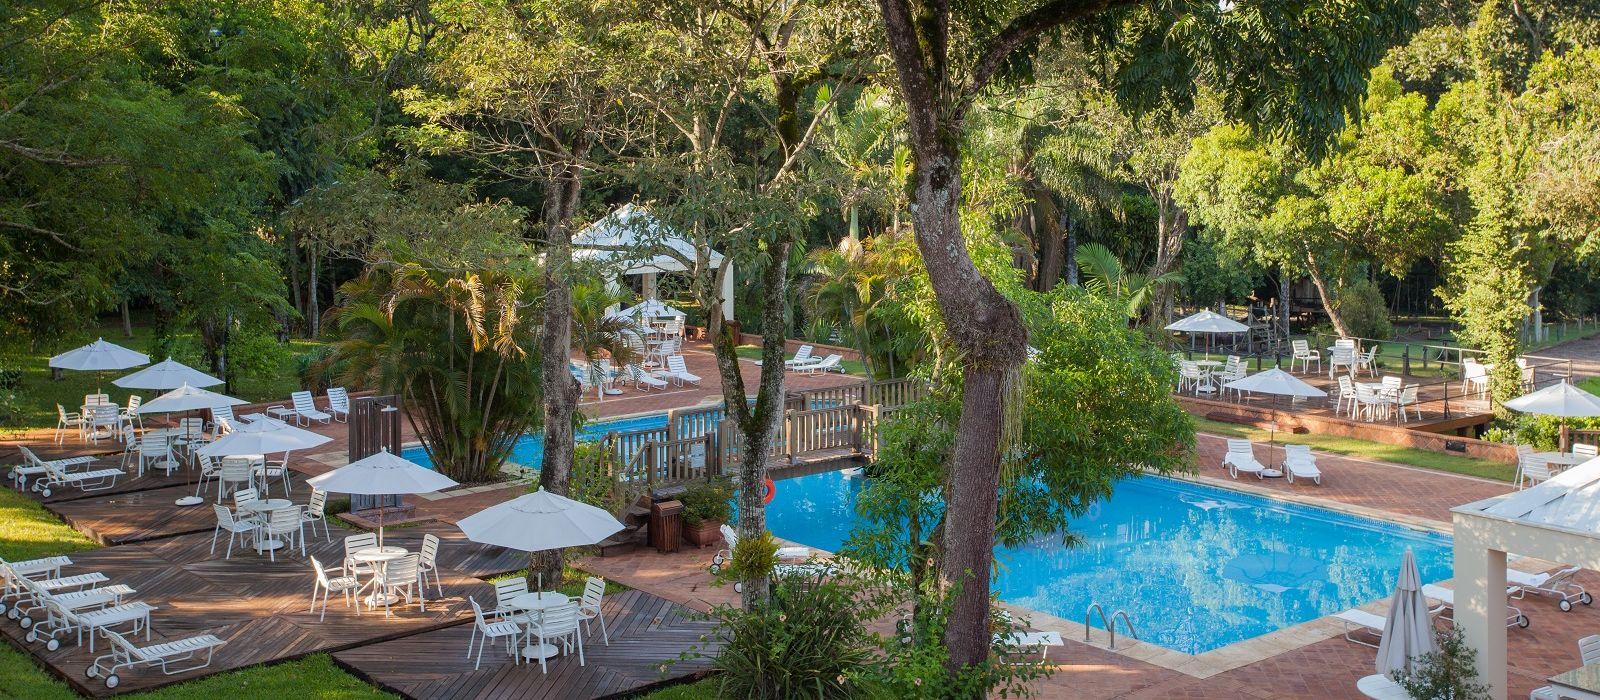 Hotel San Martin Foz do Iguacu Brazil